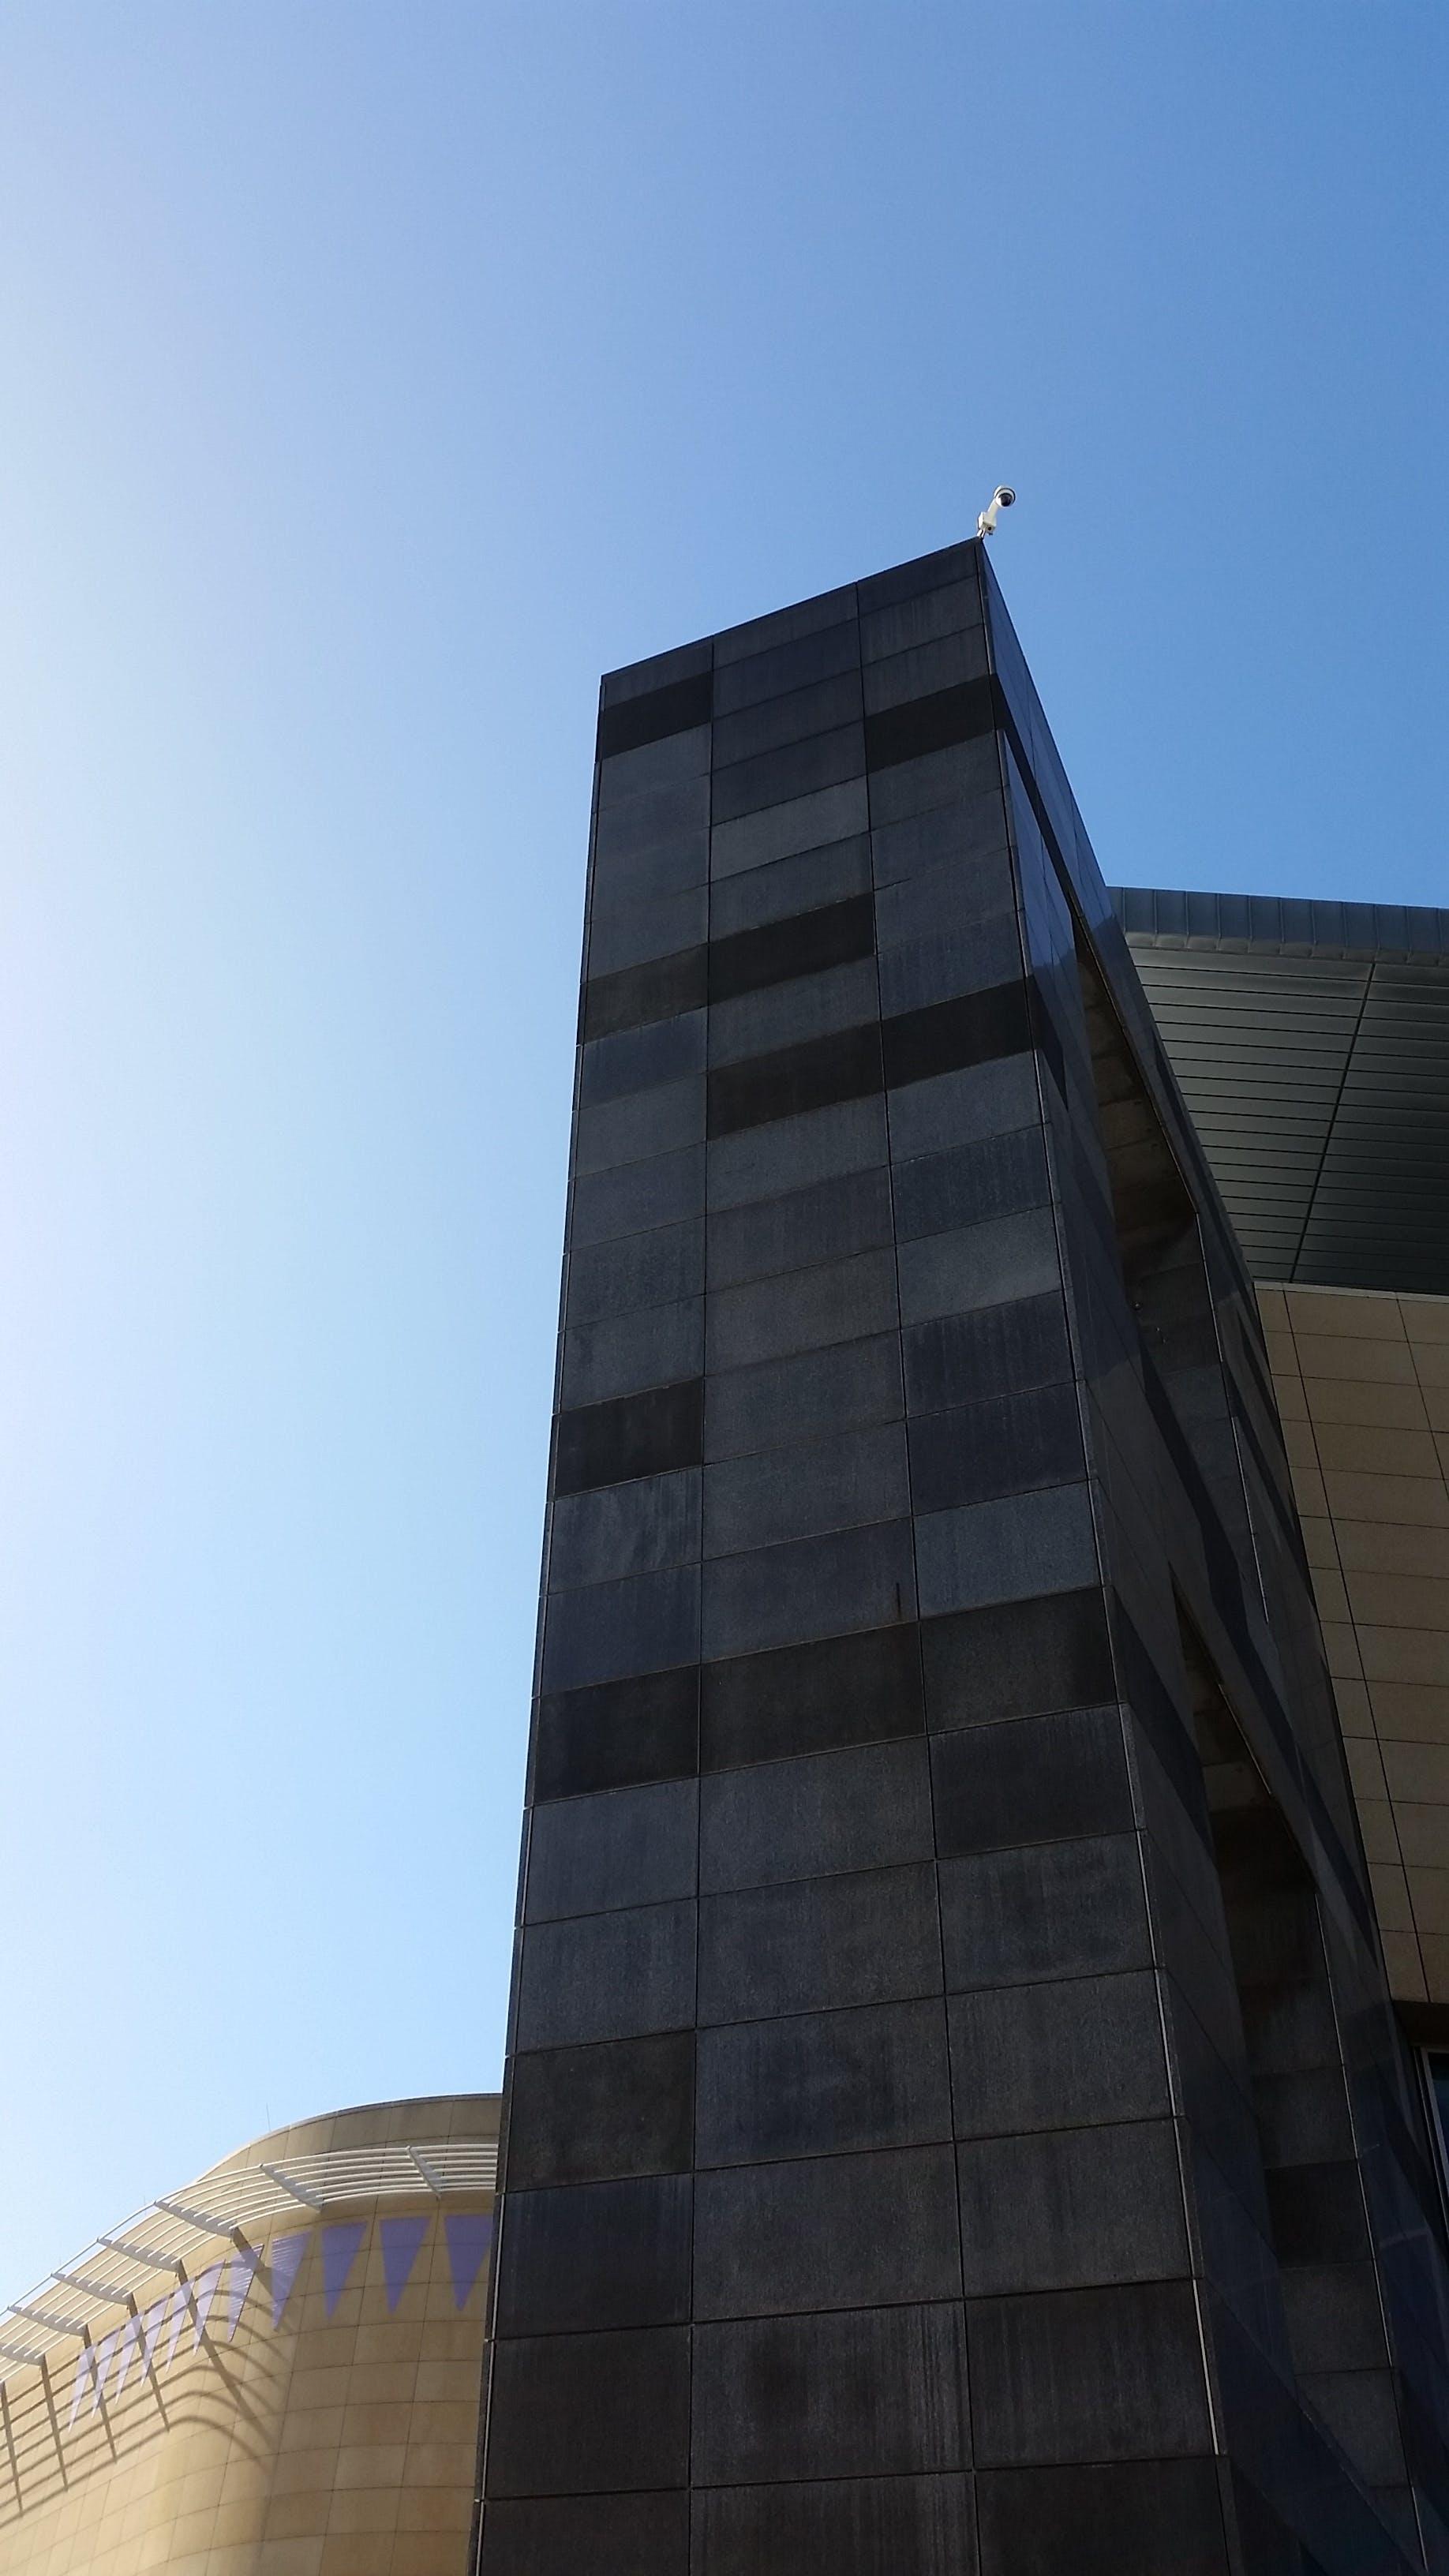 Free stock photo of sky, sunny, building, wall